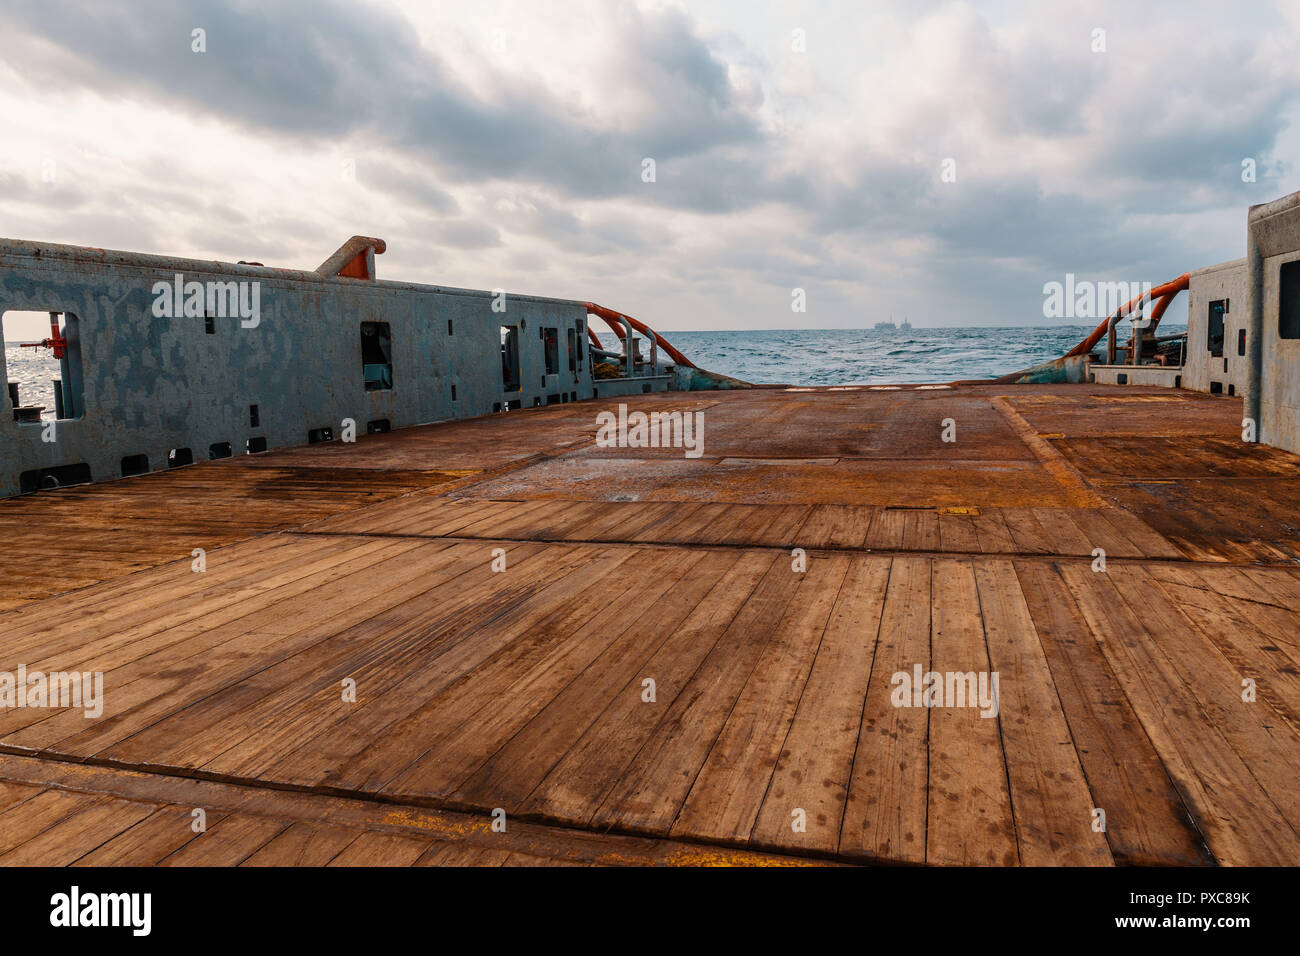 Anchor handling Tug Supply AHTS vessel deck Stock Photo